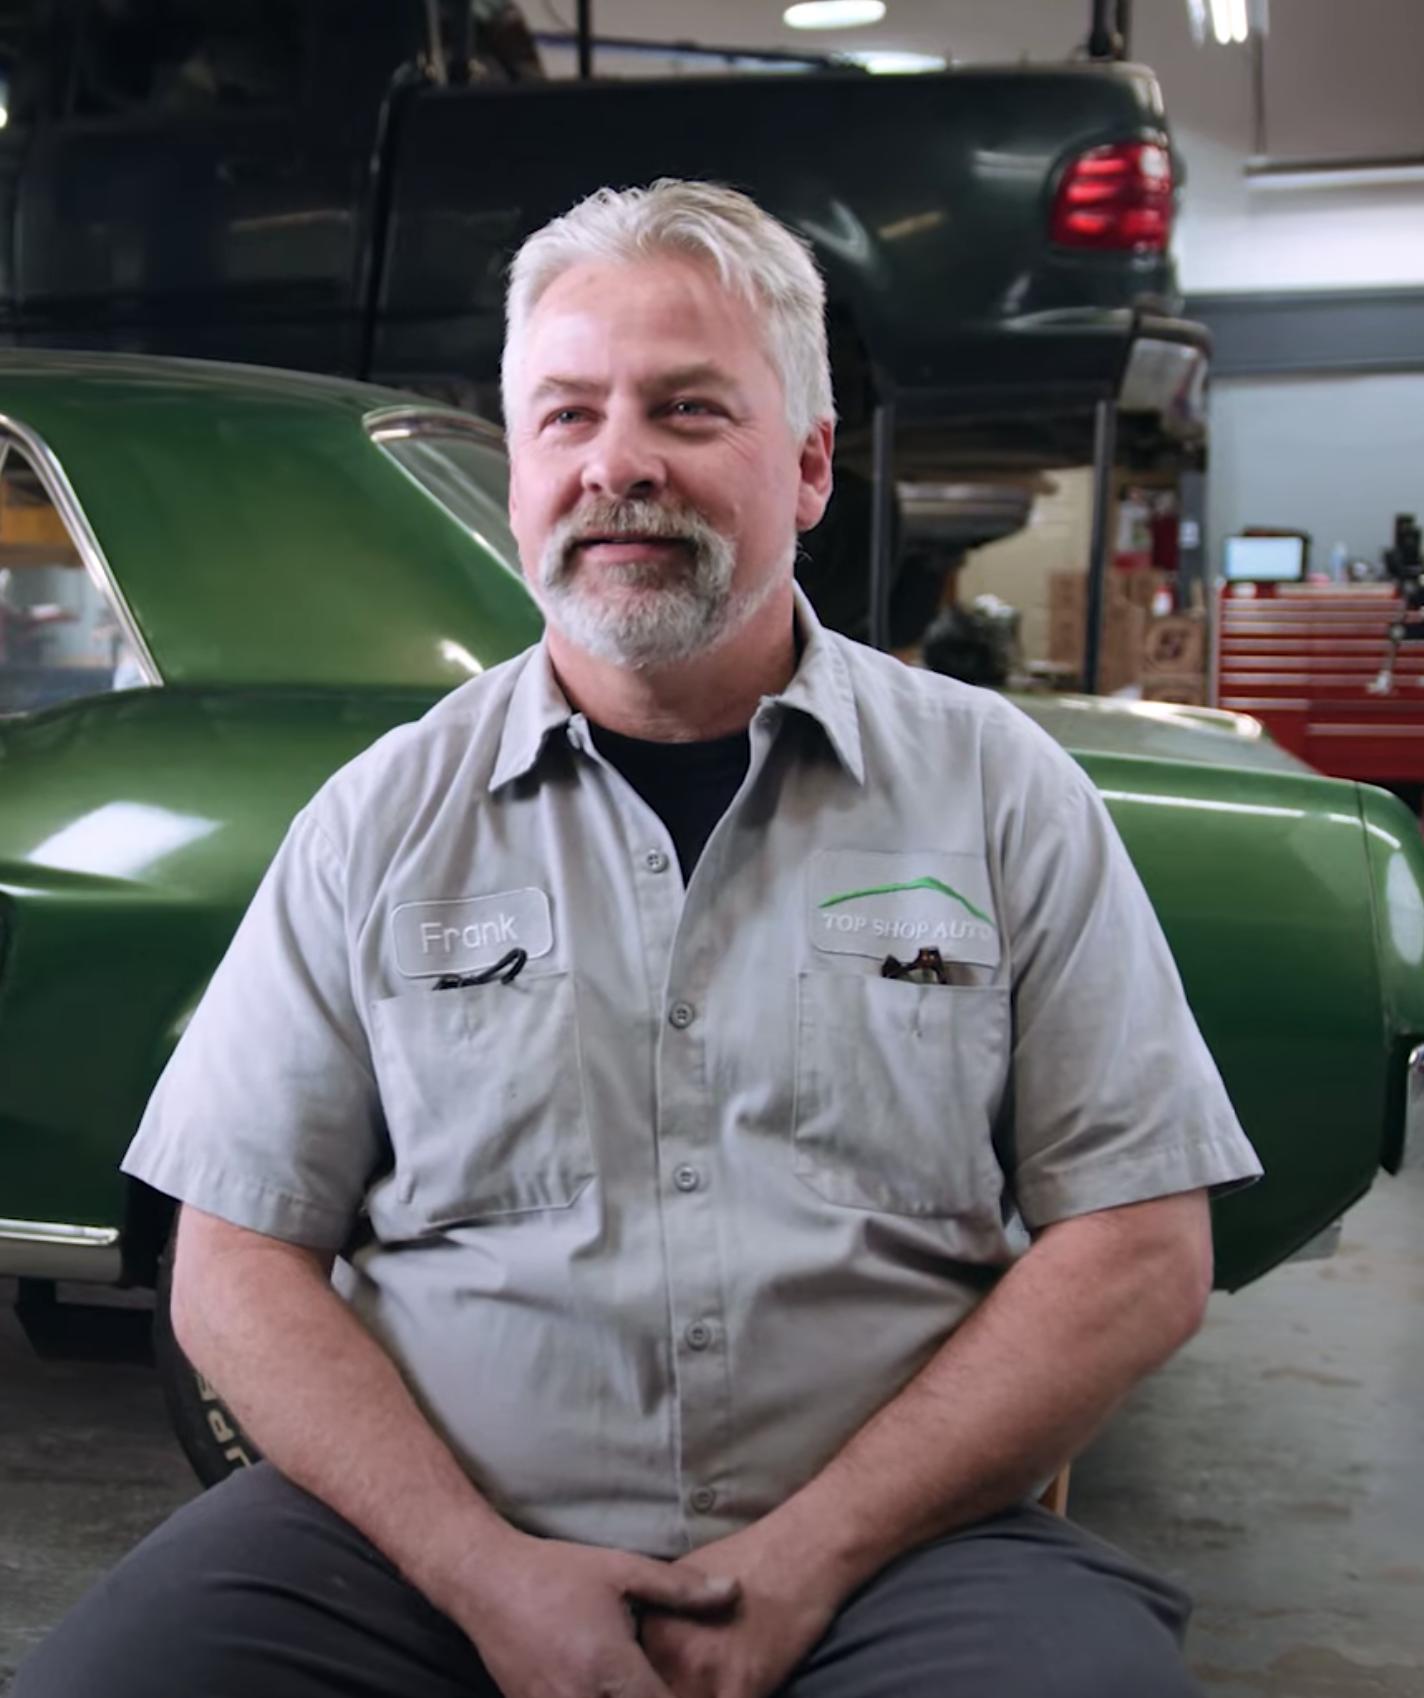 [video thumbnail] Top Shop Auto